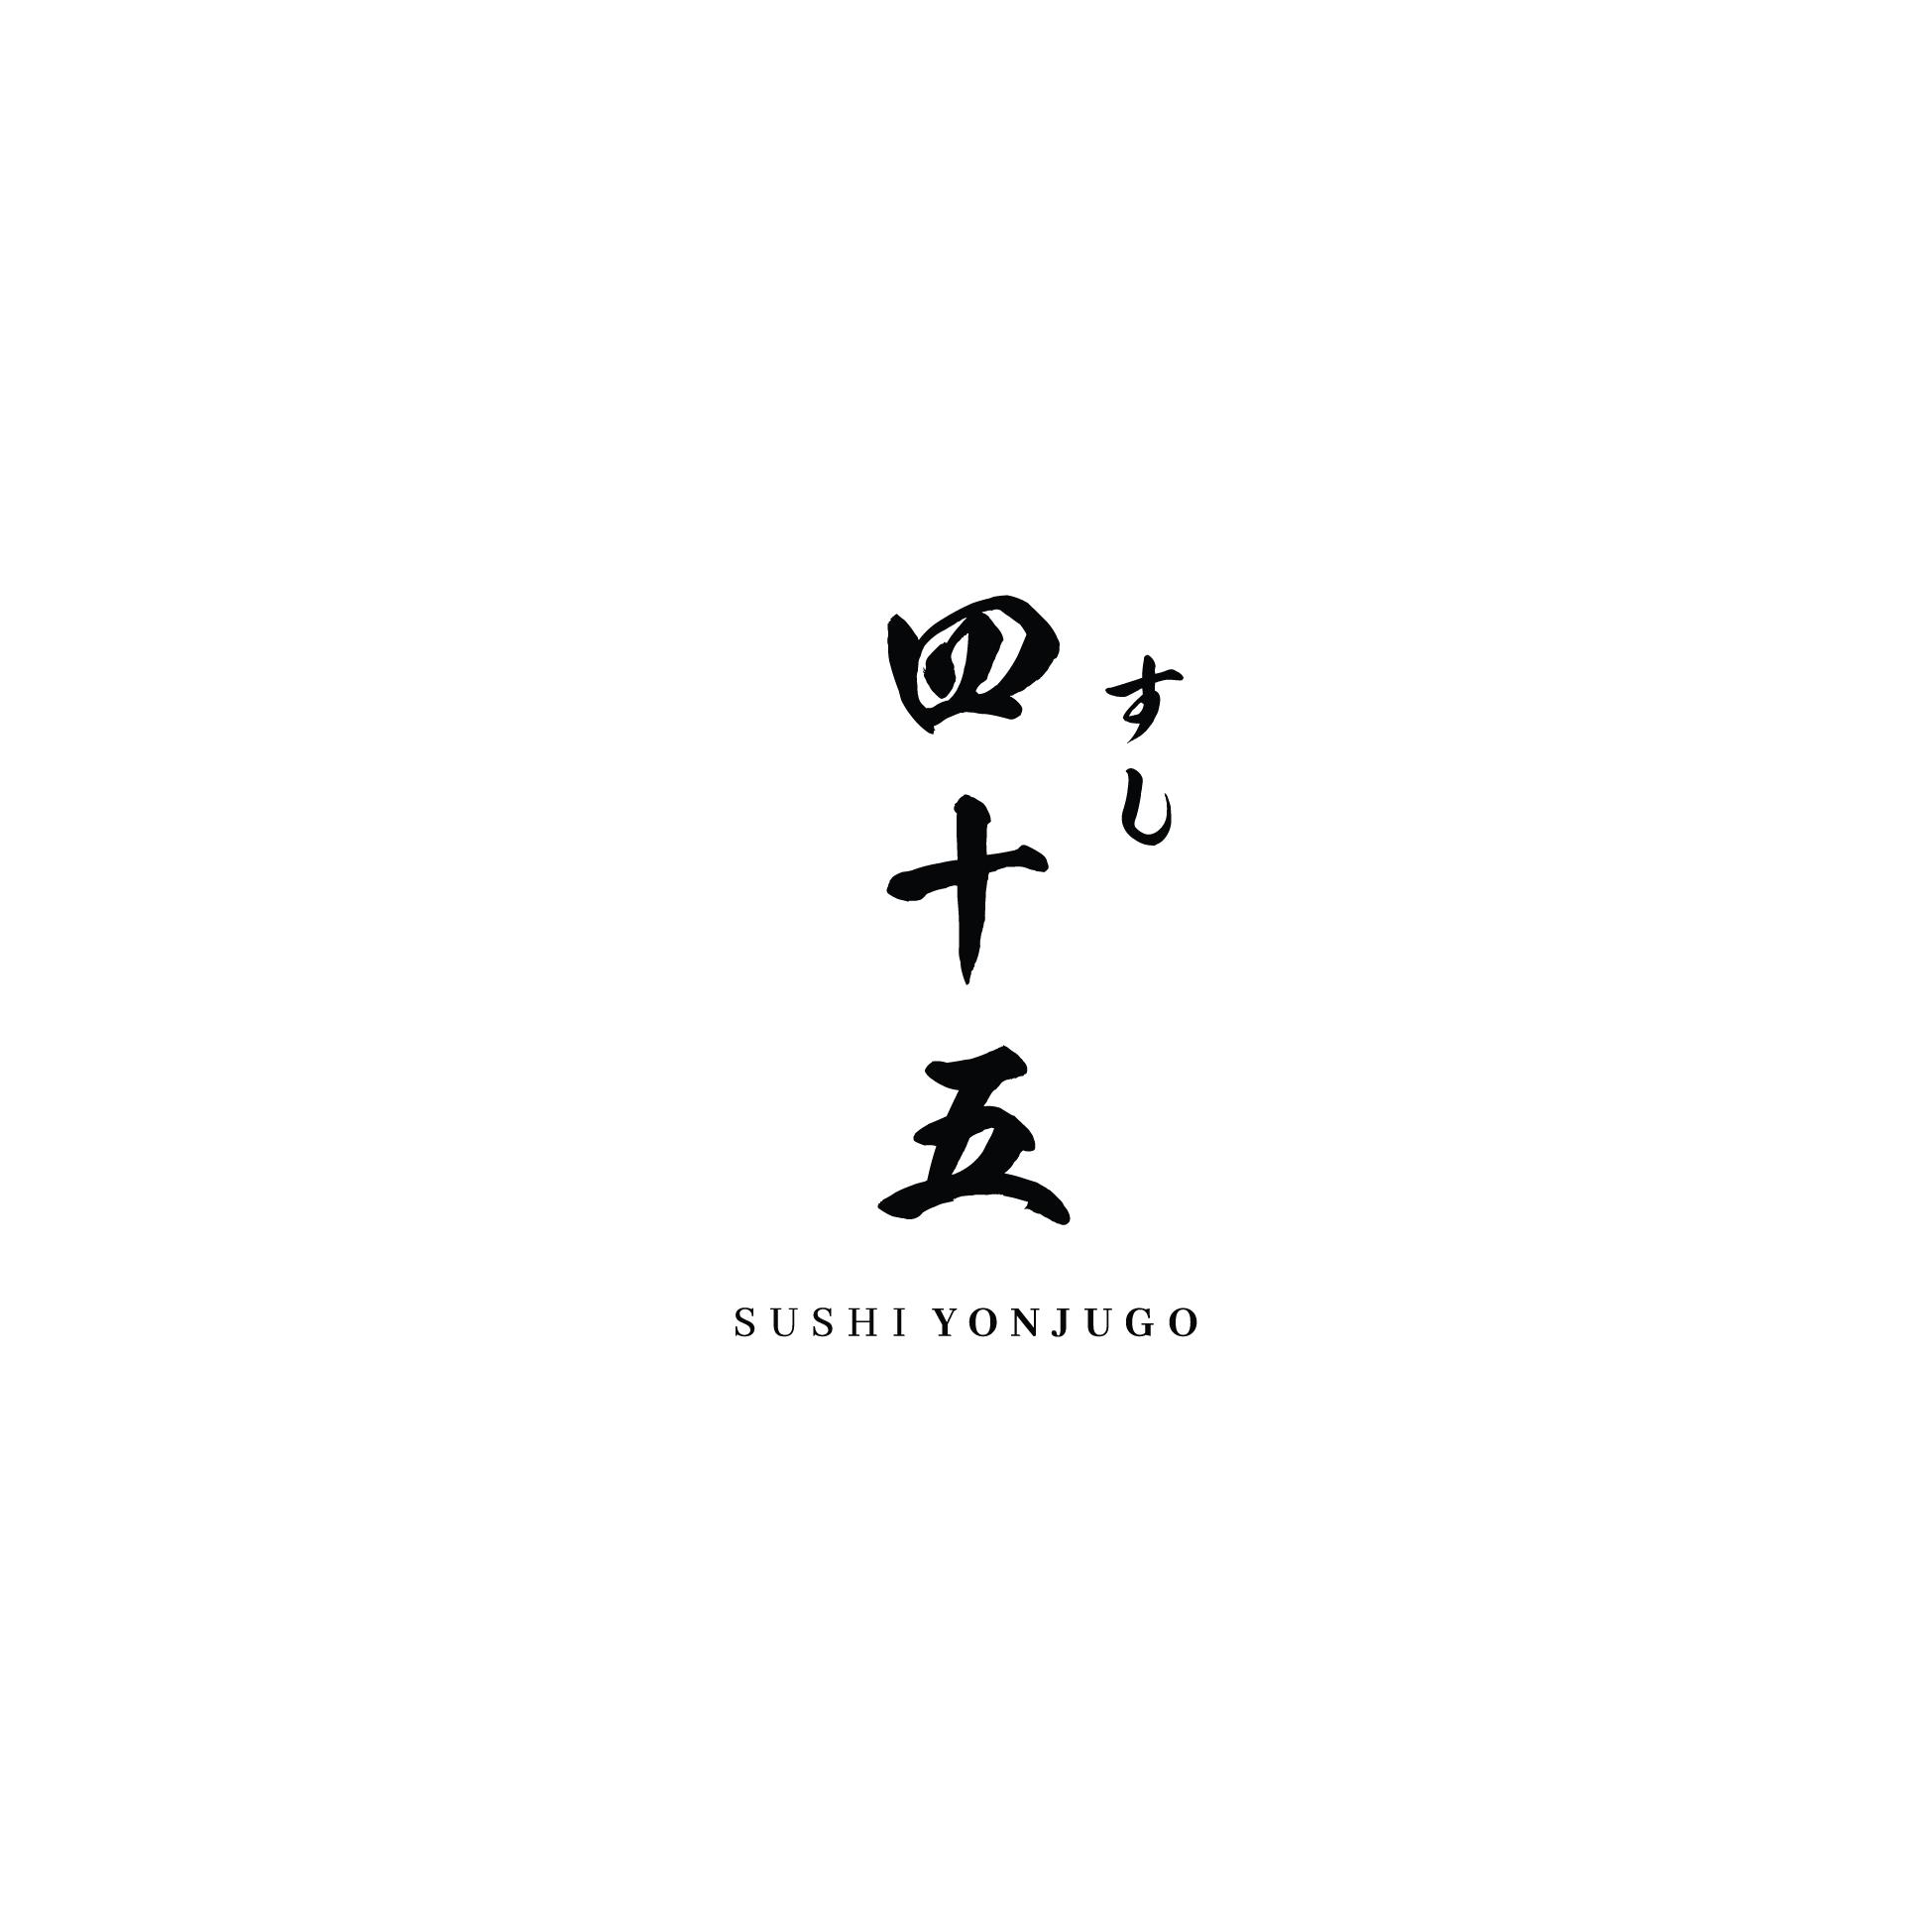 Sushi 45 LimitedFloor Server